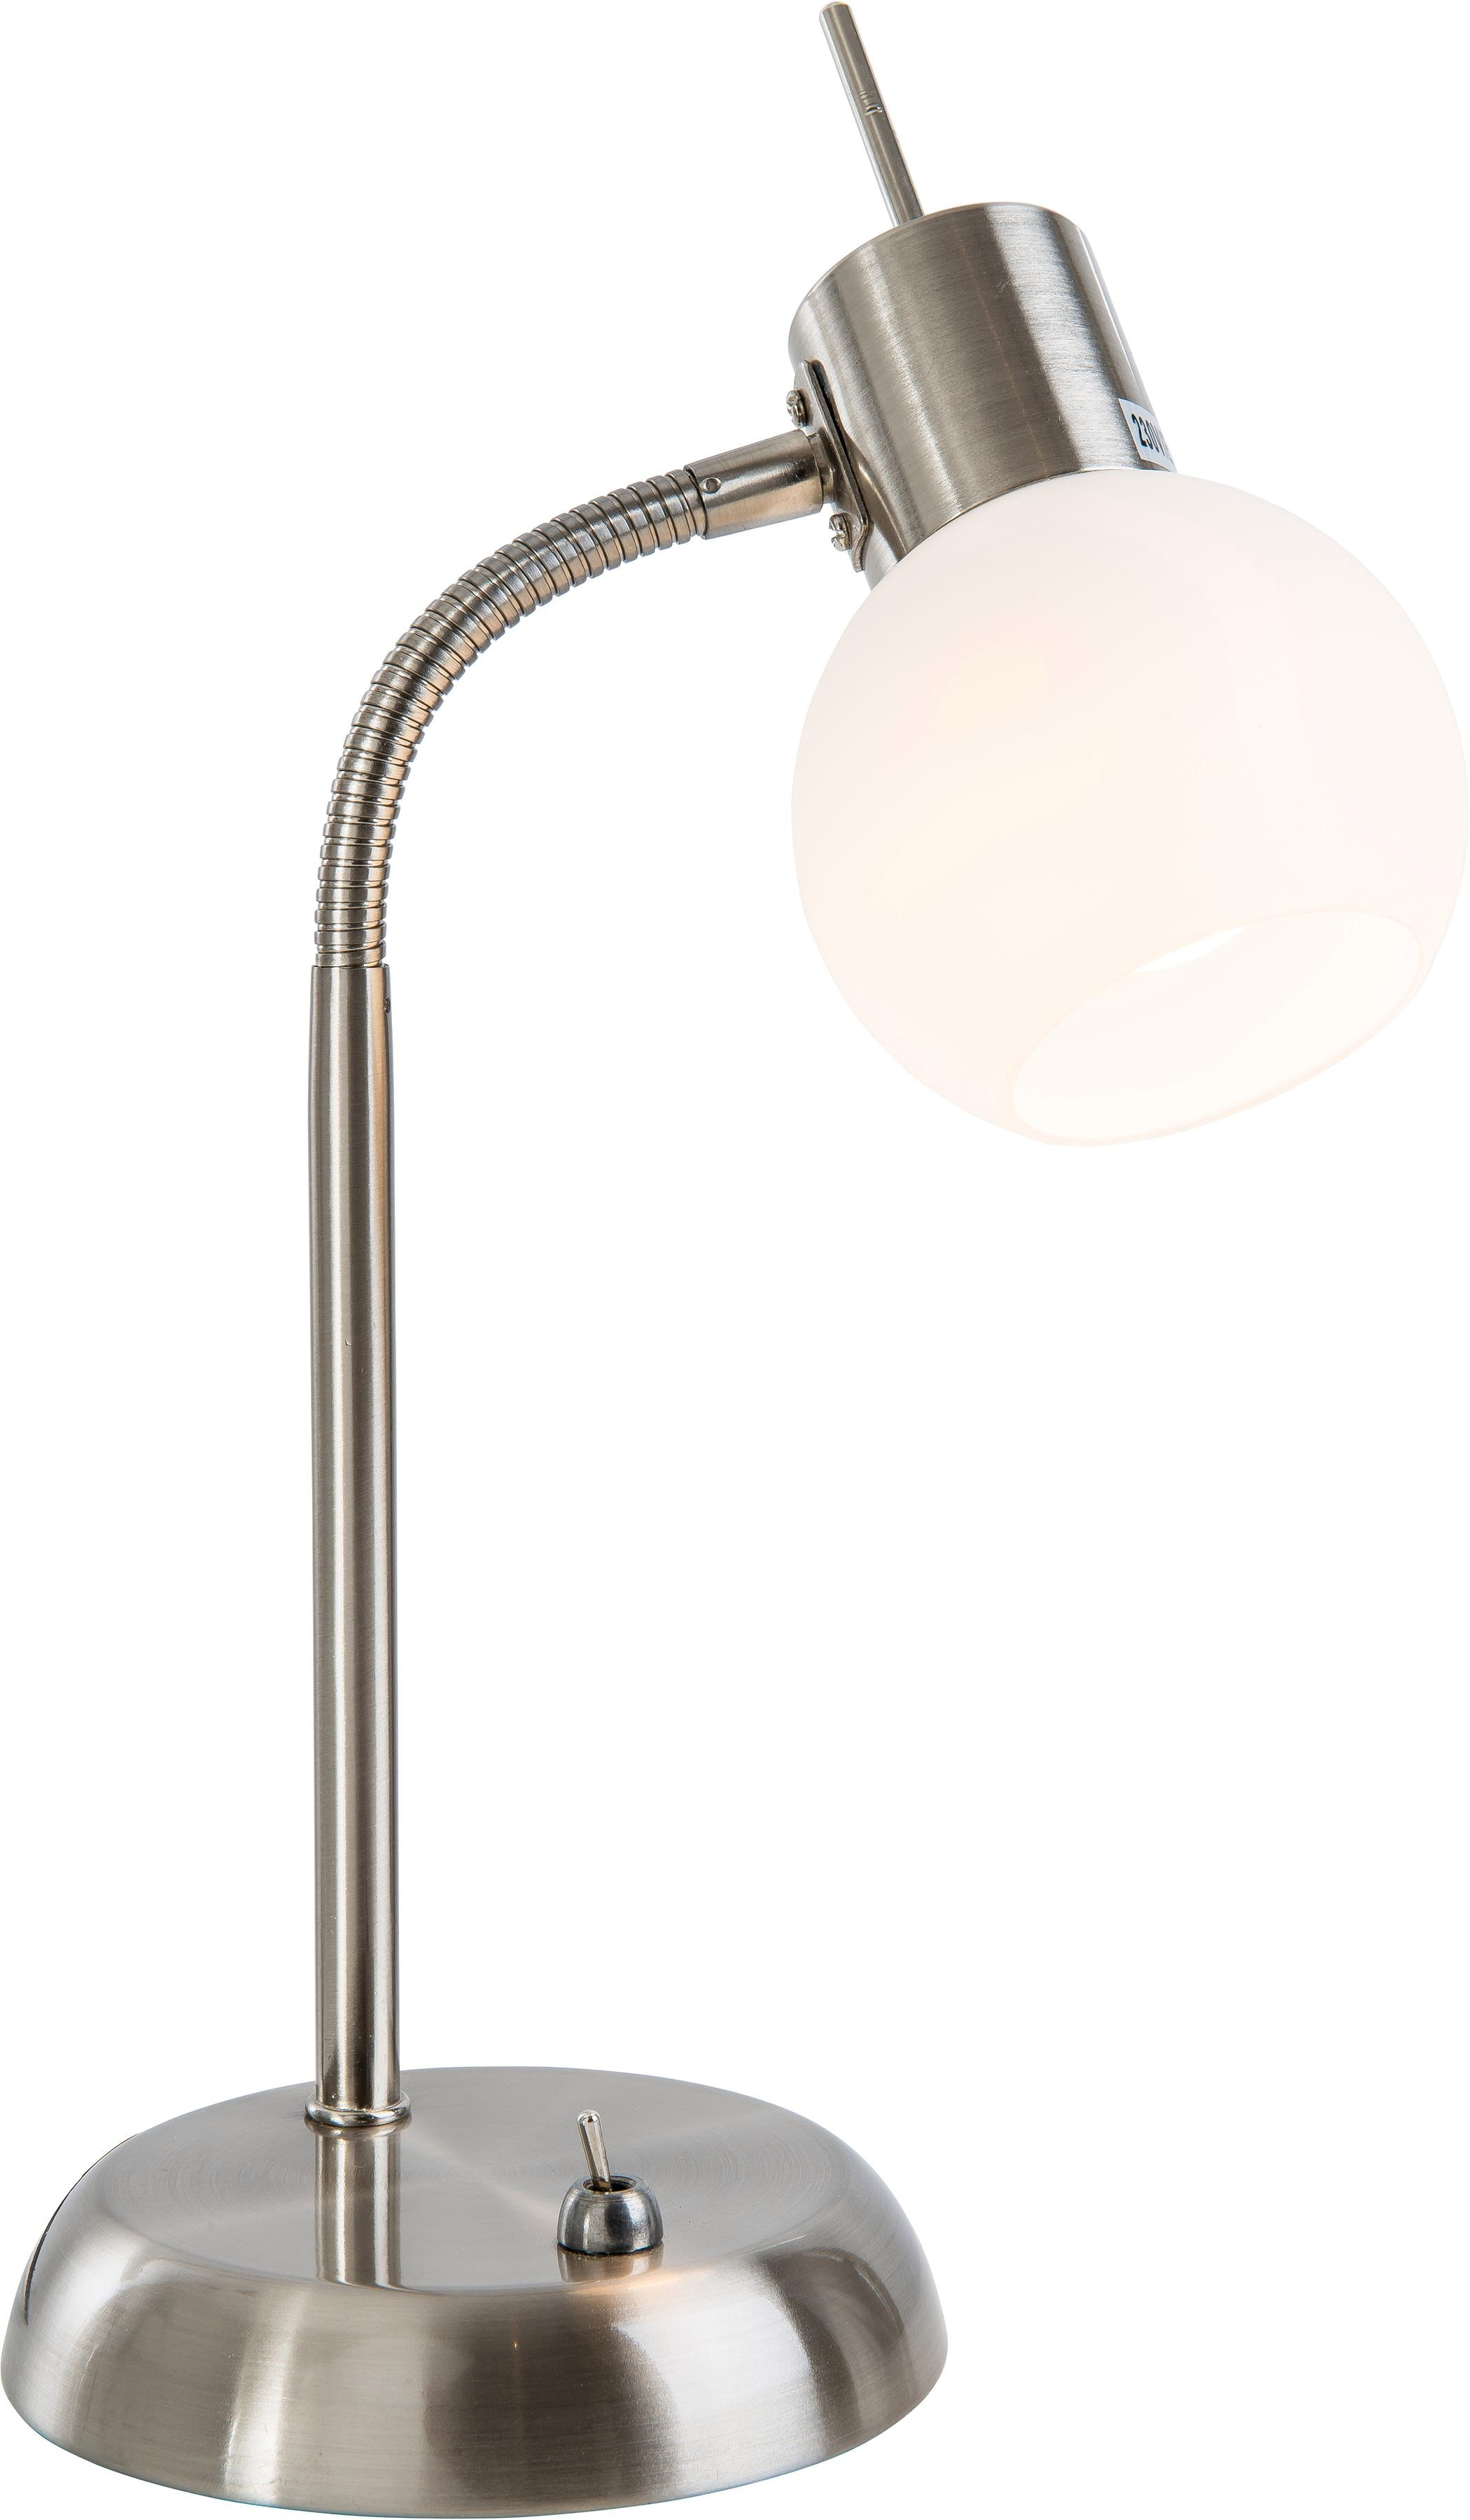 Nino Leuchten,LED Tischleuchte LOXY